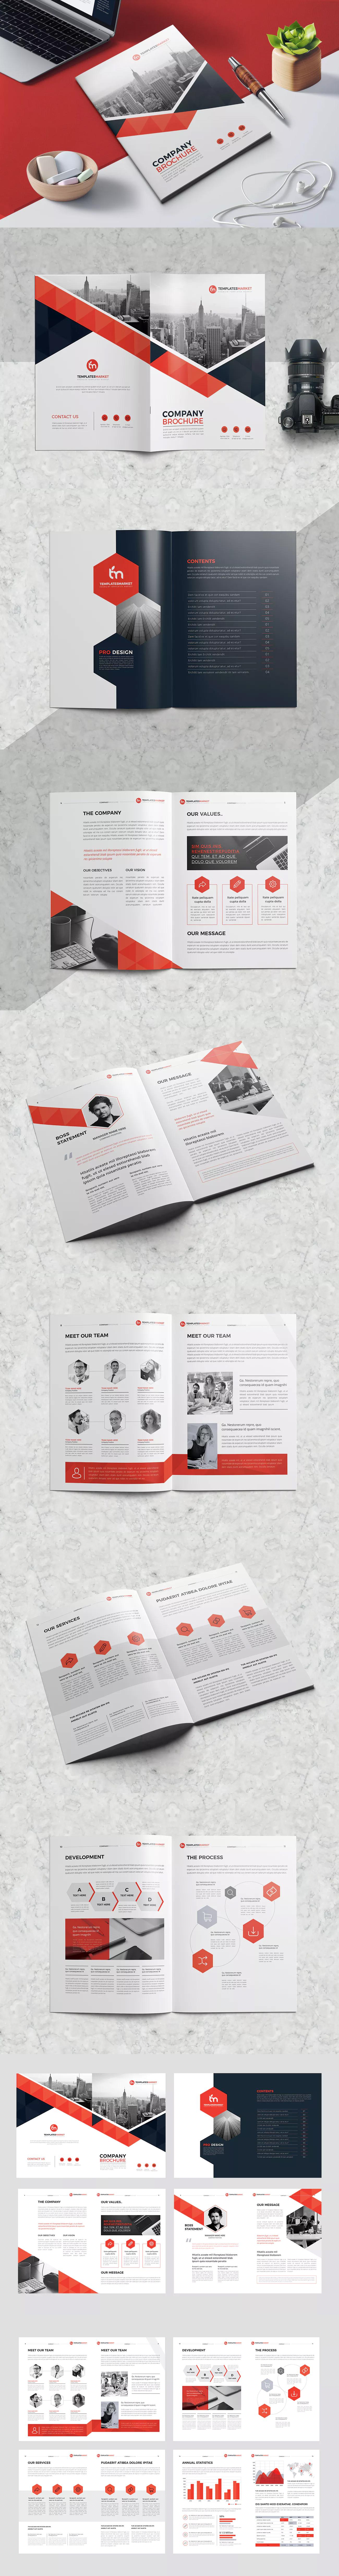 TM Company Profile Template InDesign INDD A4 | Company Profile ...